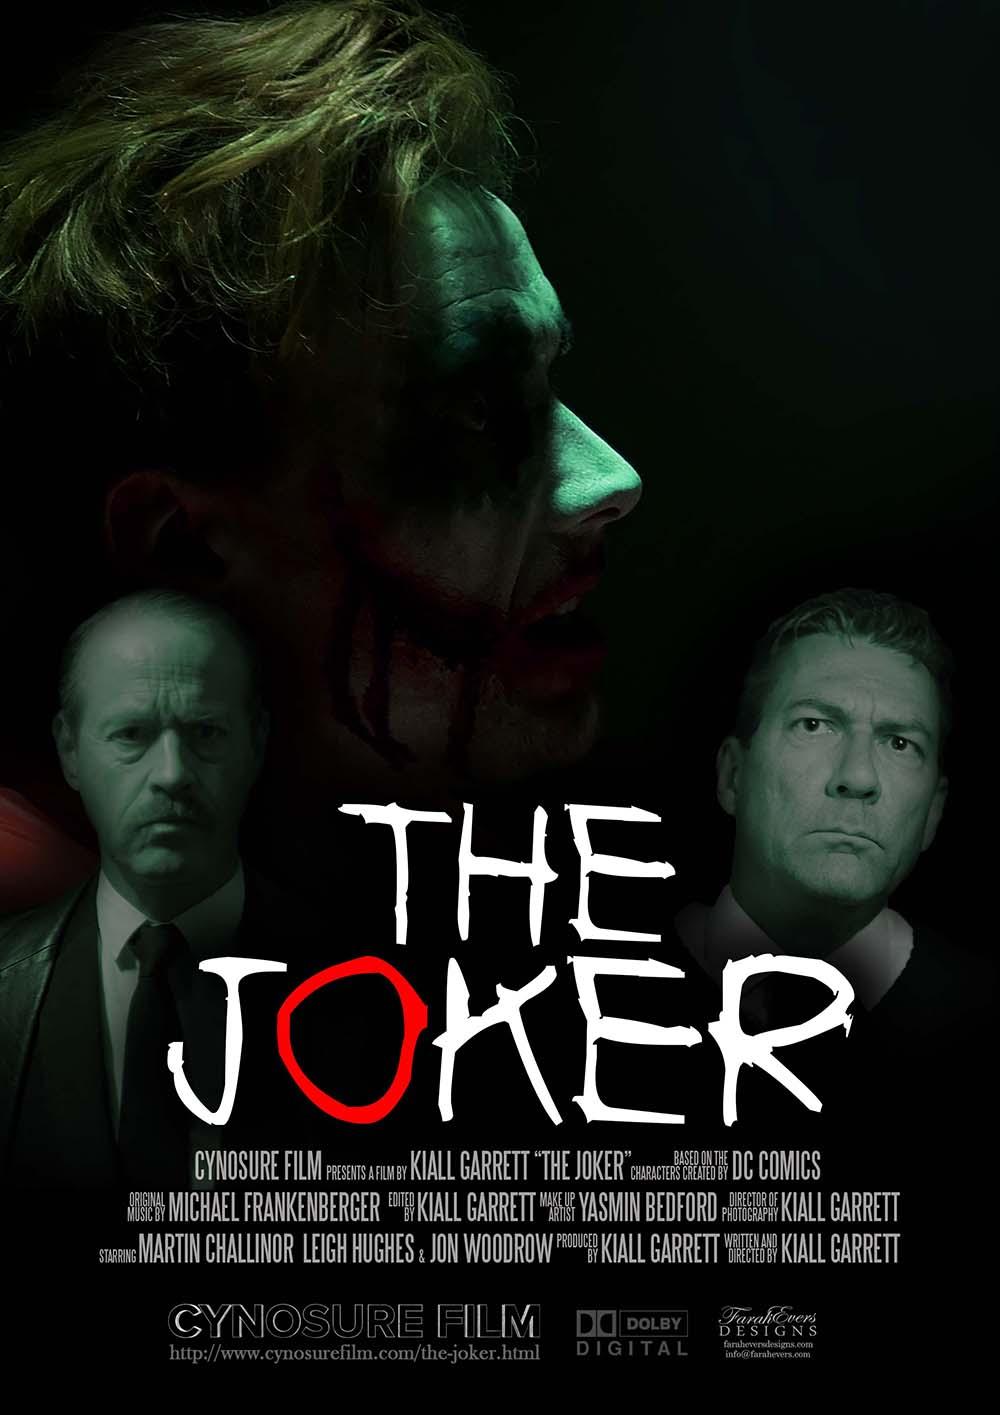 The Joker 2017 Imdb